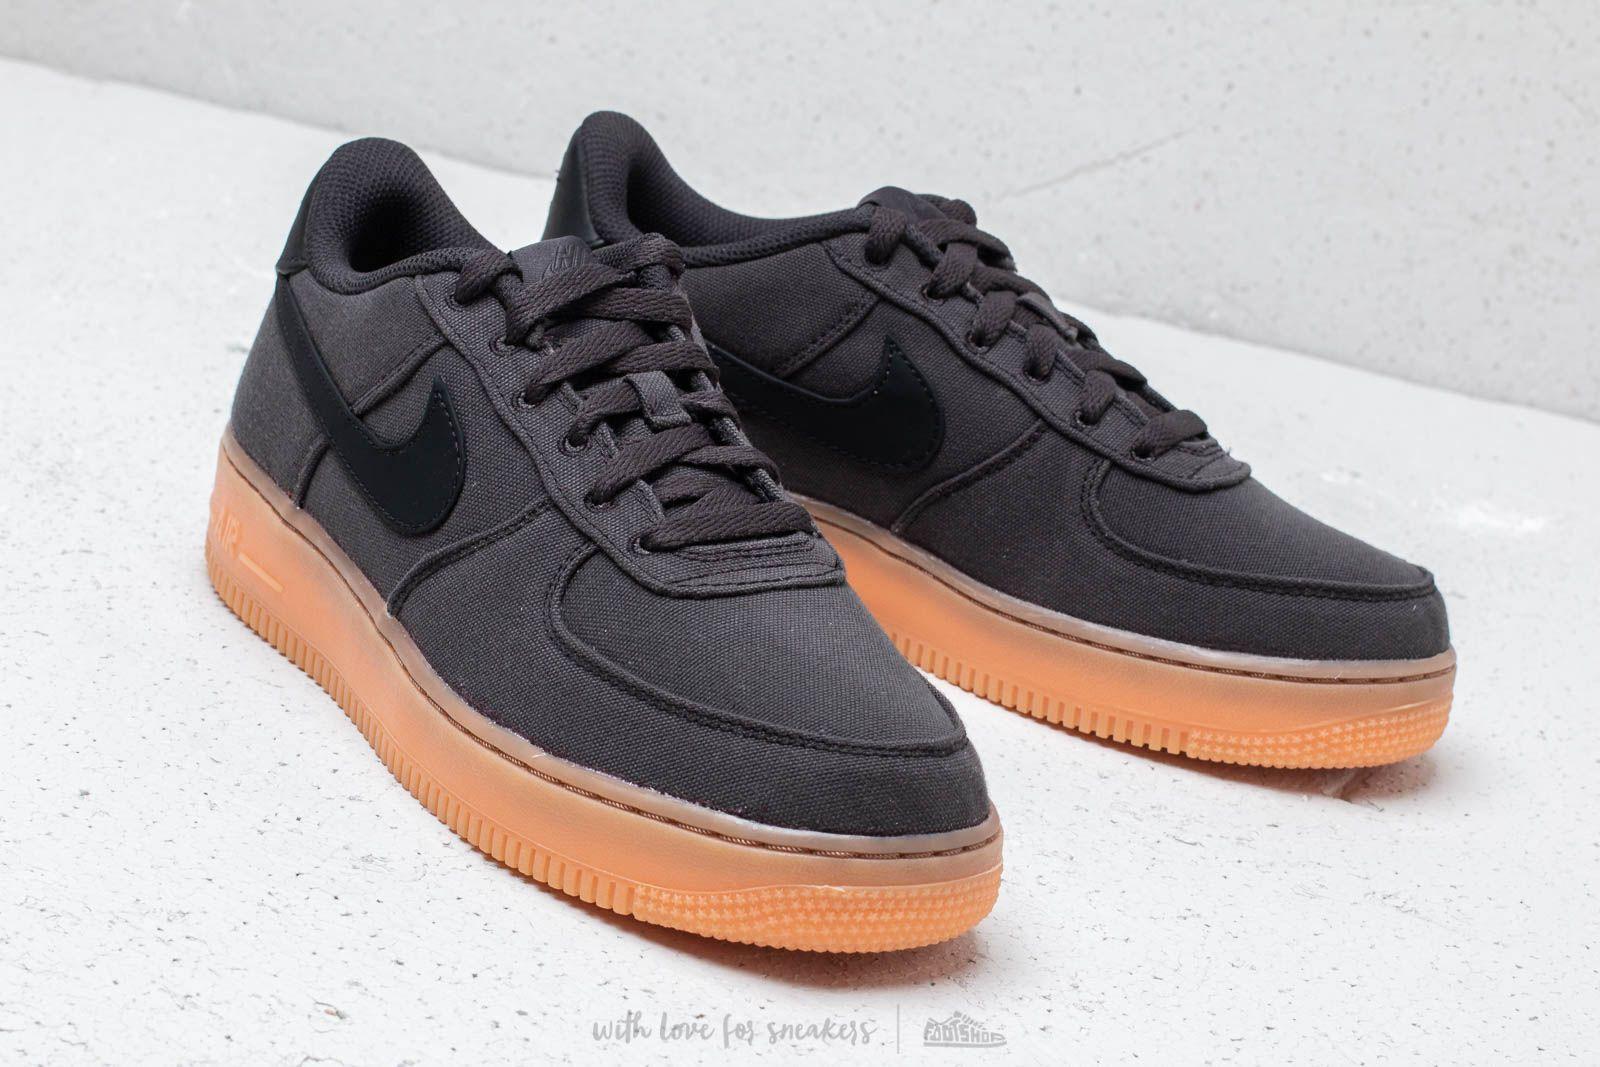 Nike Air Force 1  07 LV8 Style Black  Black-Gum Med Brown at 016bd8aded